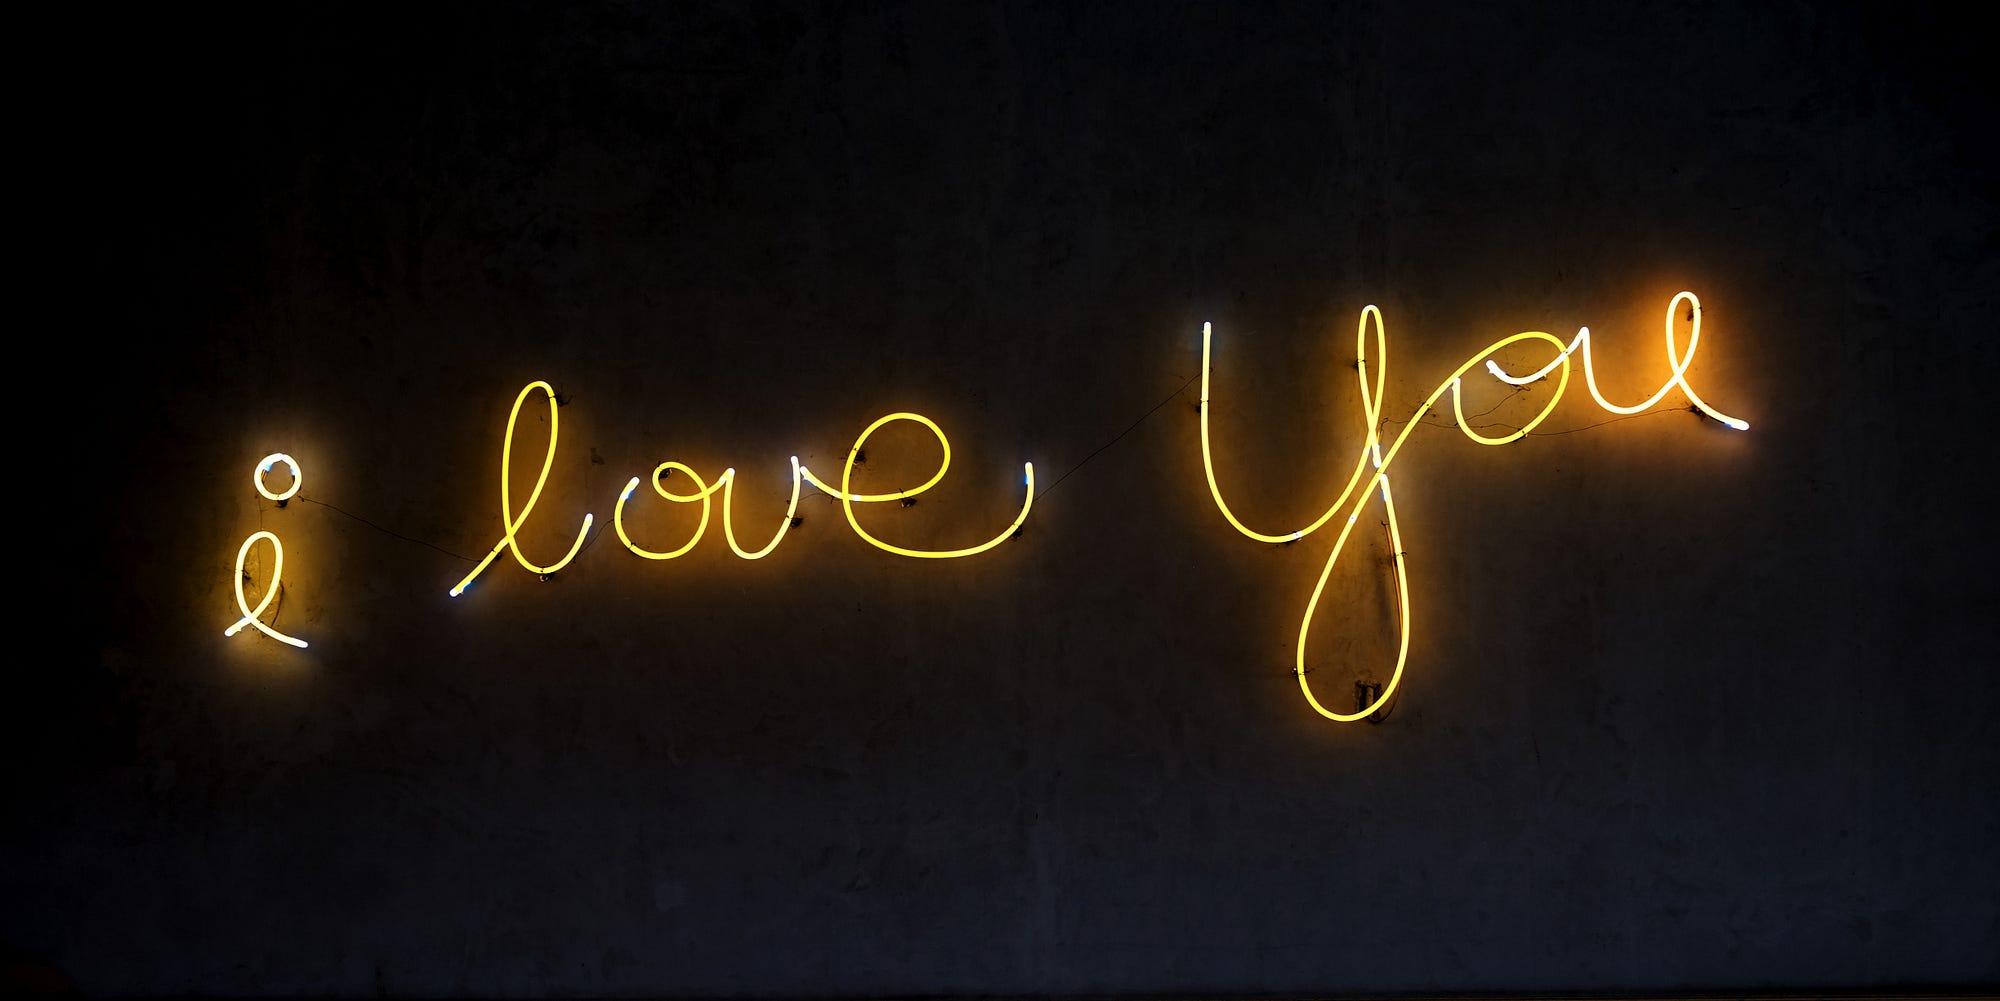 Book Quotes Wallpaper Cursive I Have Never Said I Love You P S I Love You